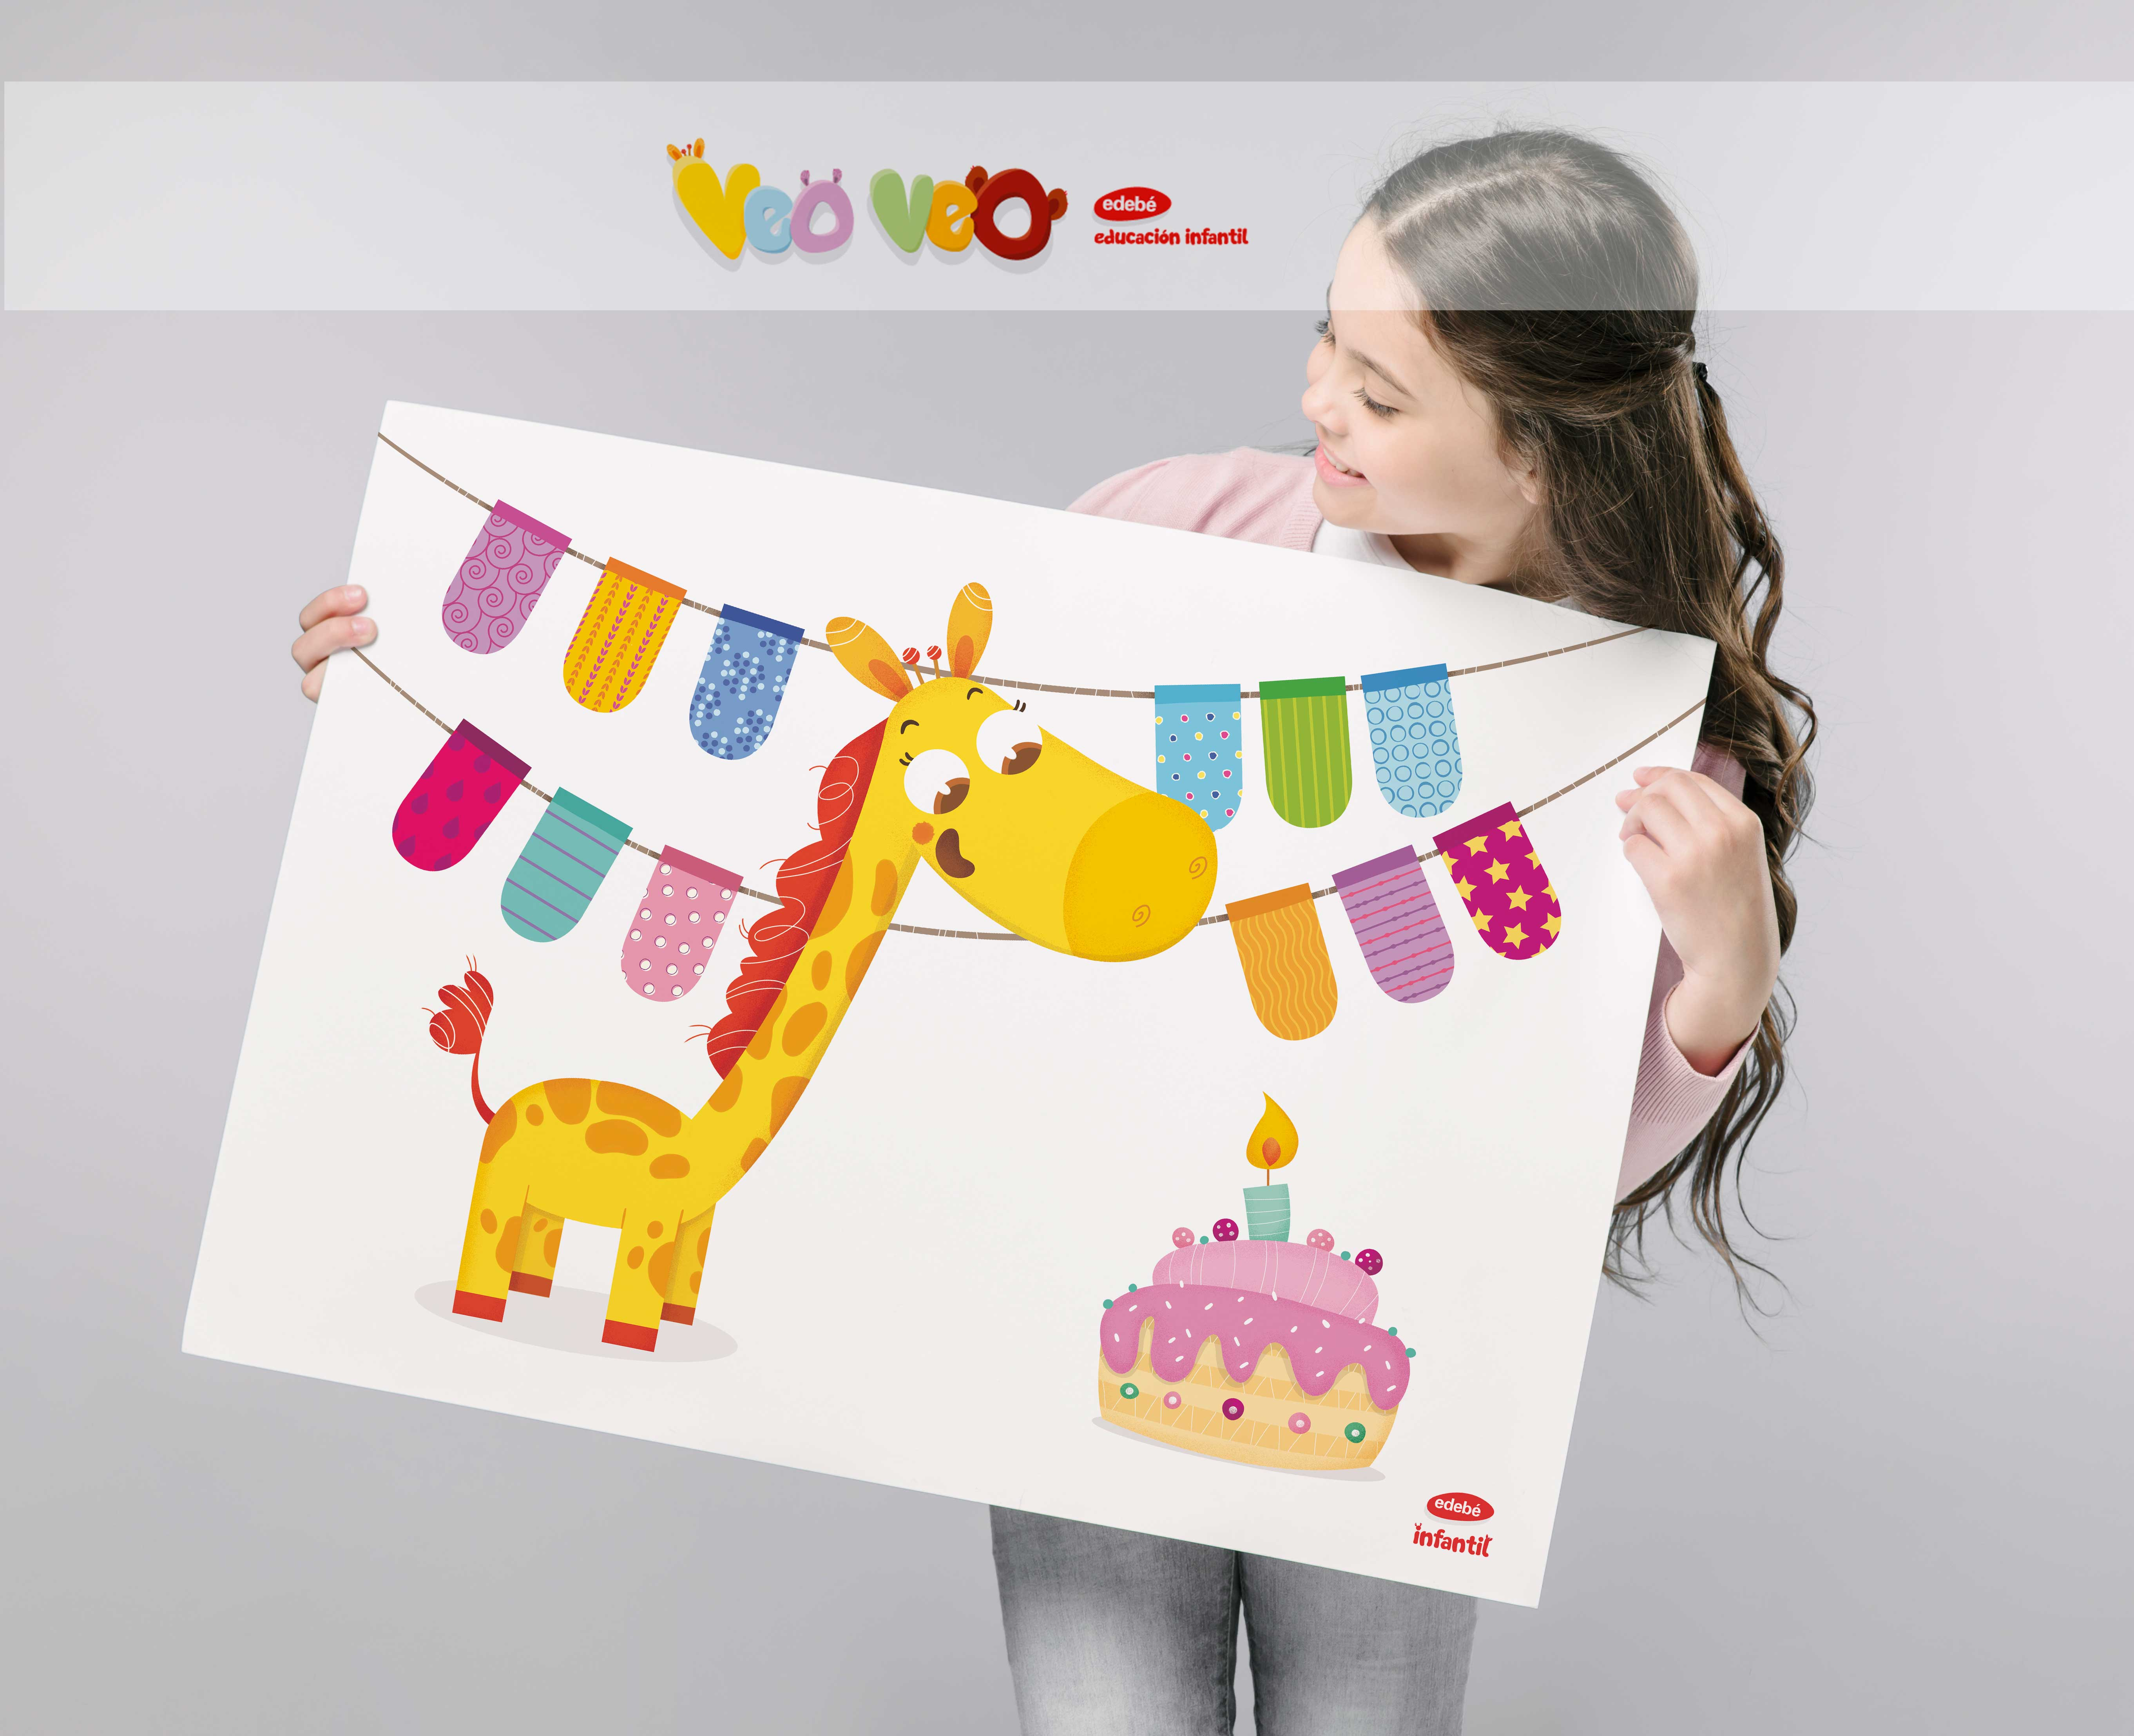 mural_cumpleaños_nina_children_illustration_veo_veo